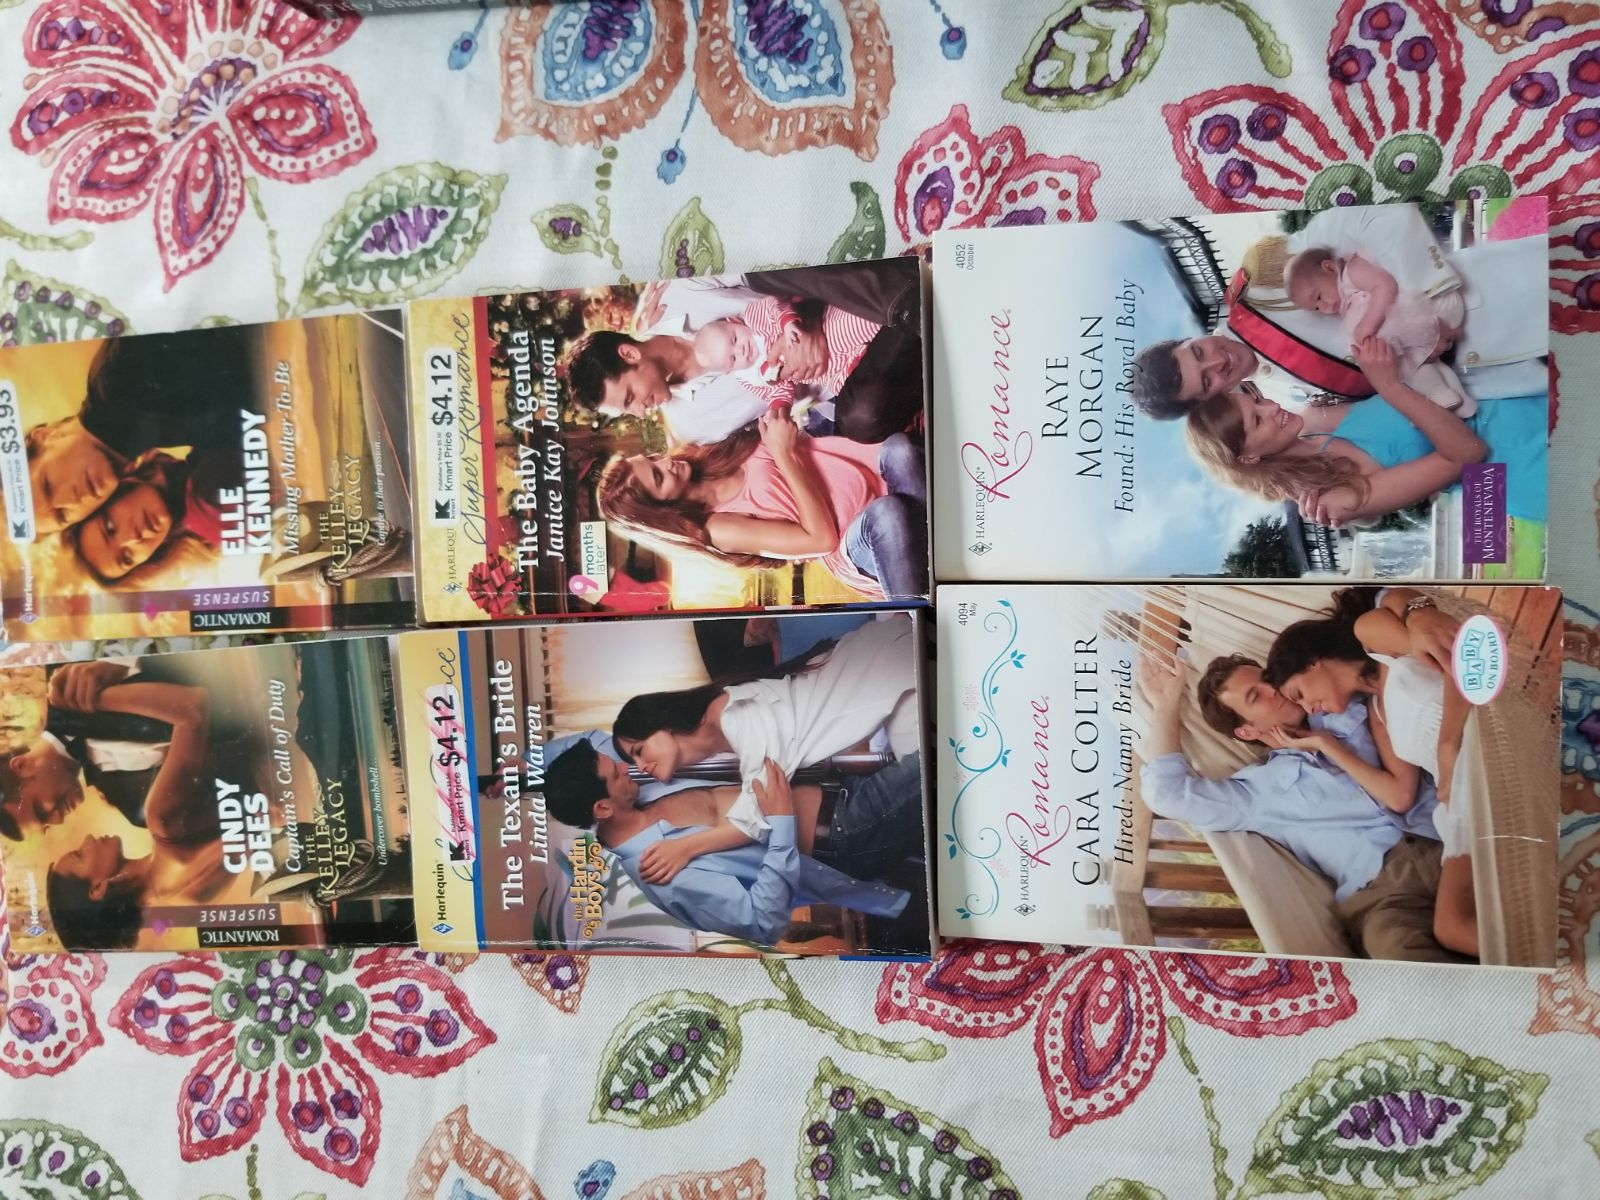 6 romance novels